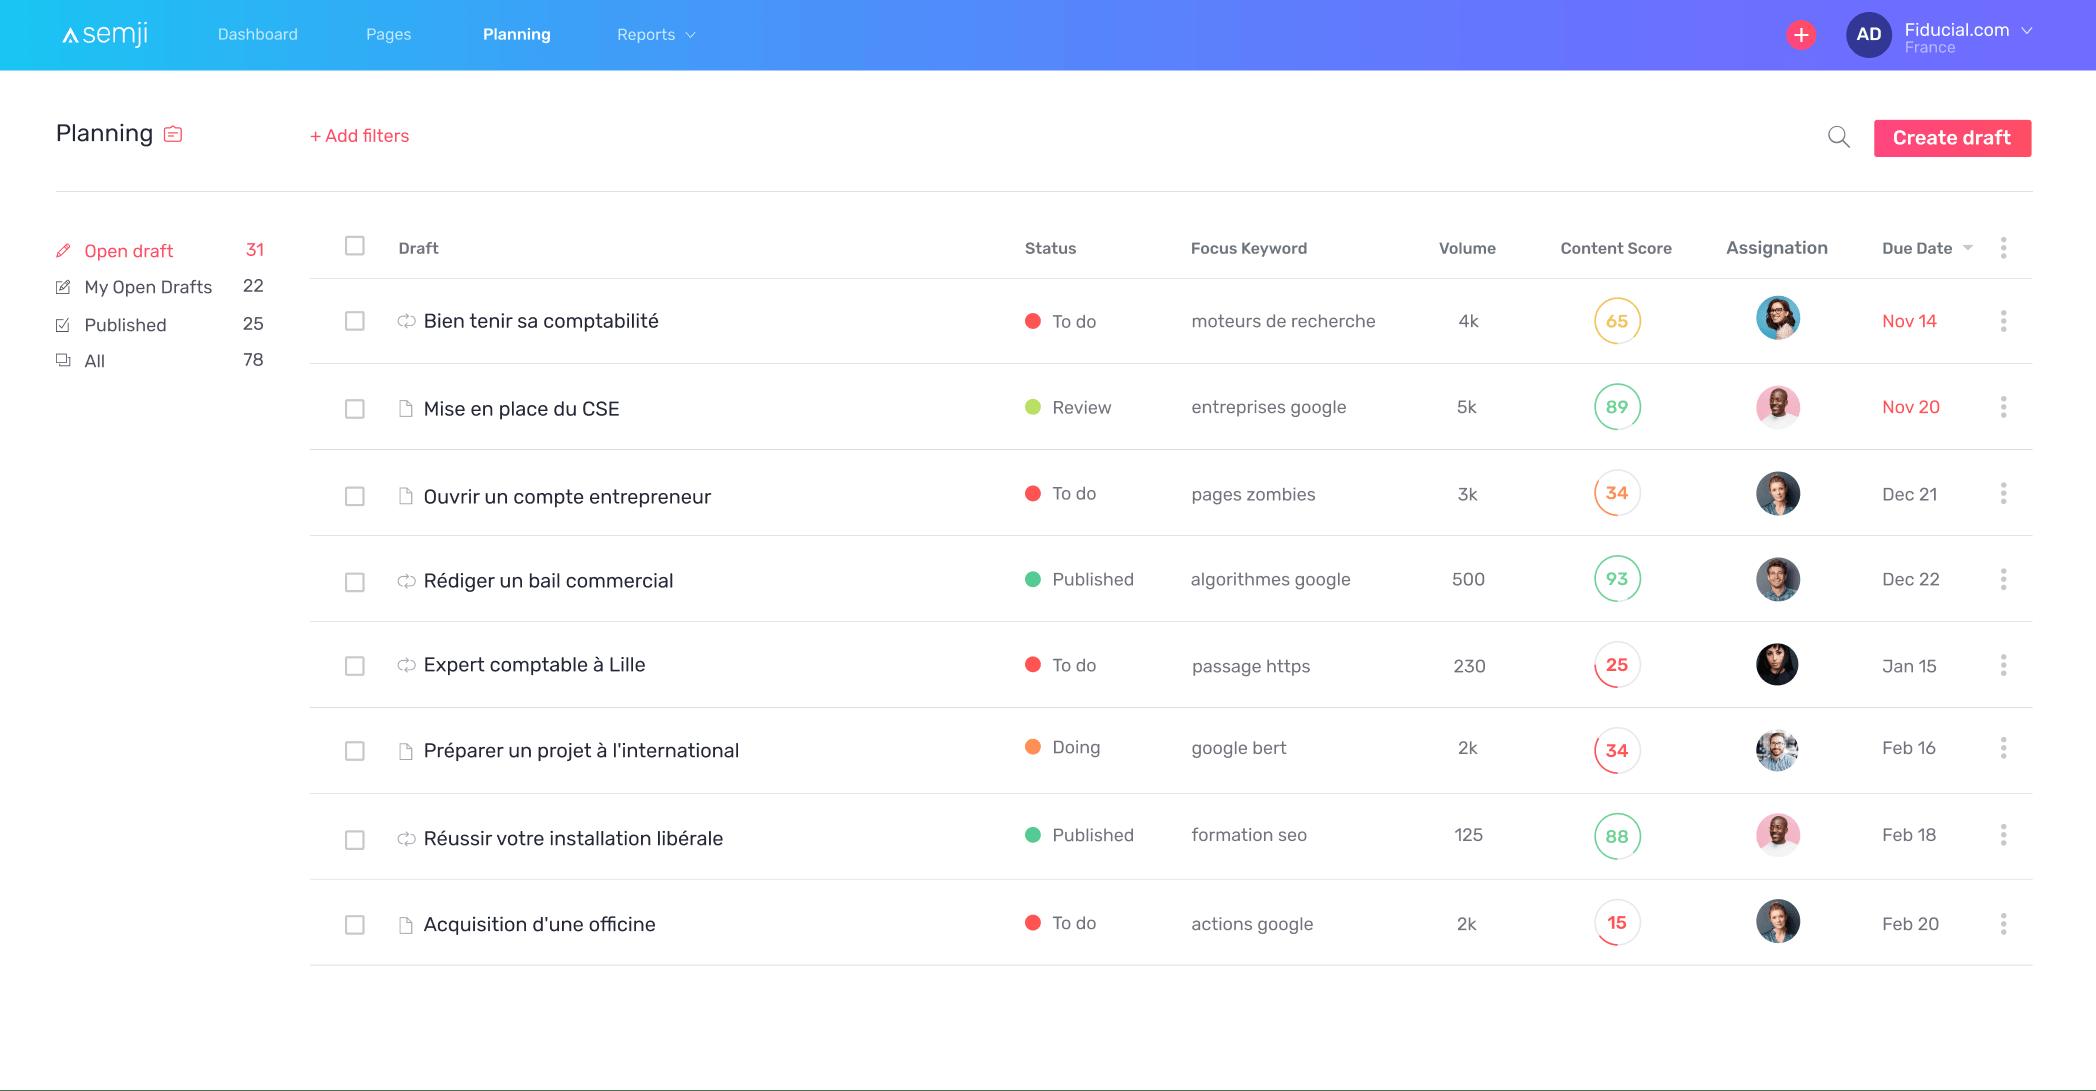 Ecran Planning Semji Platform